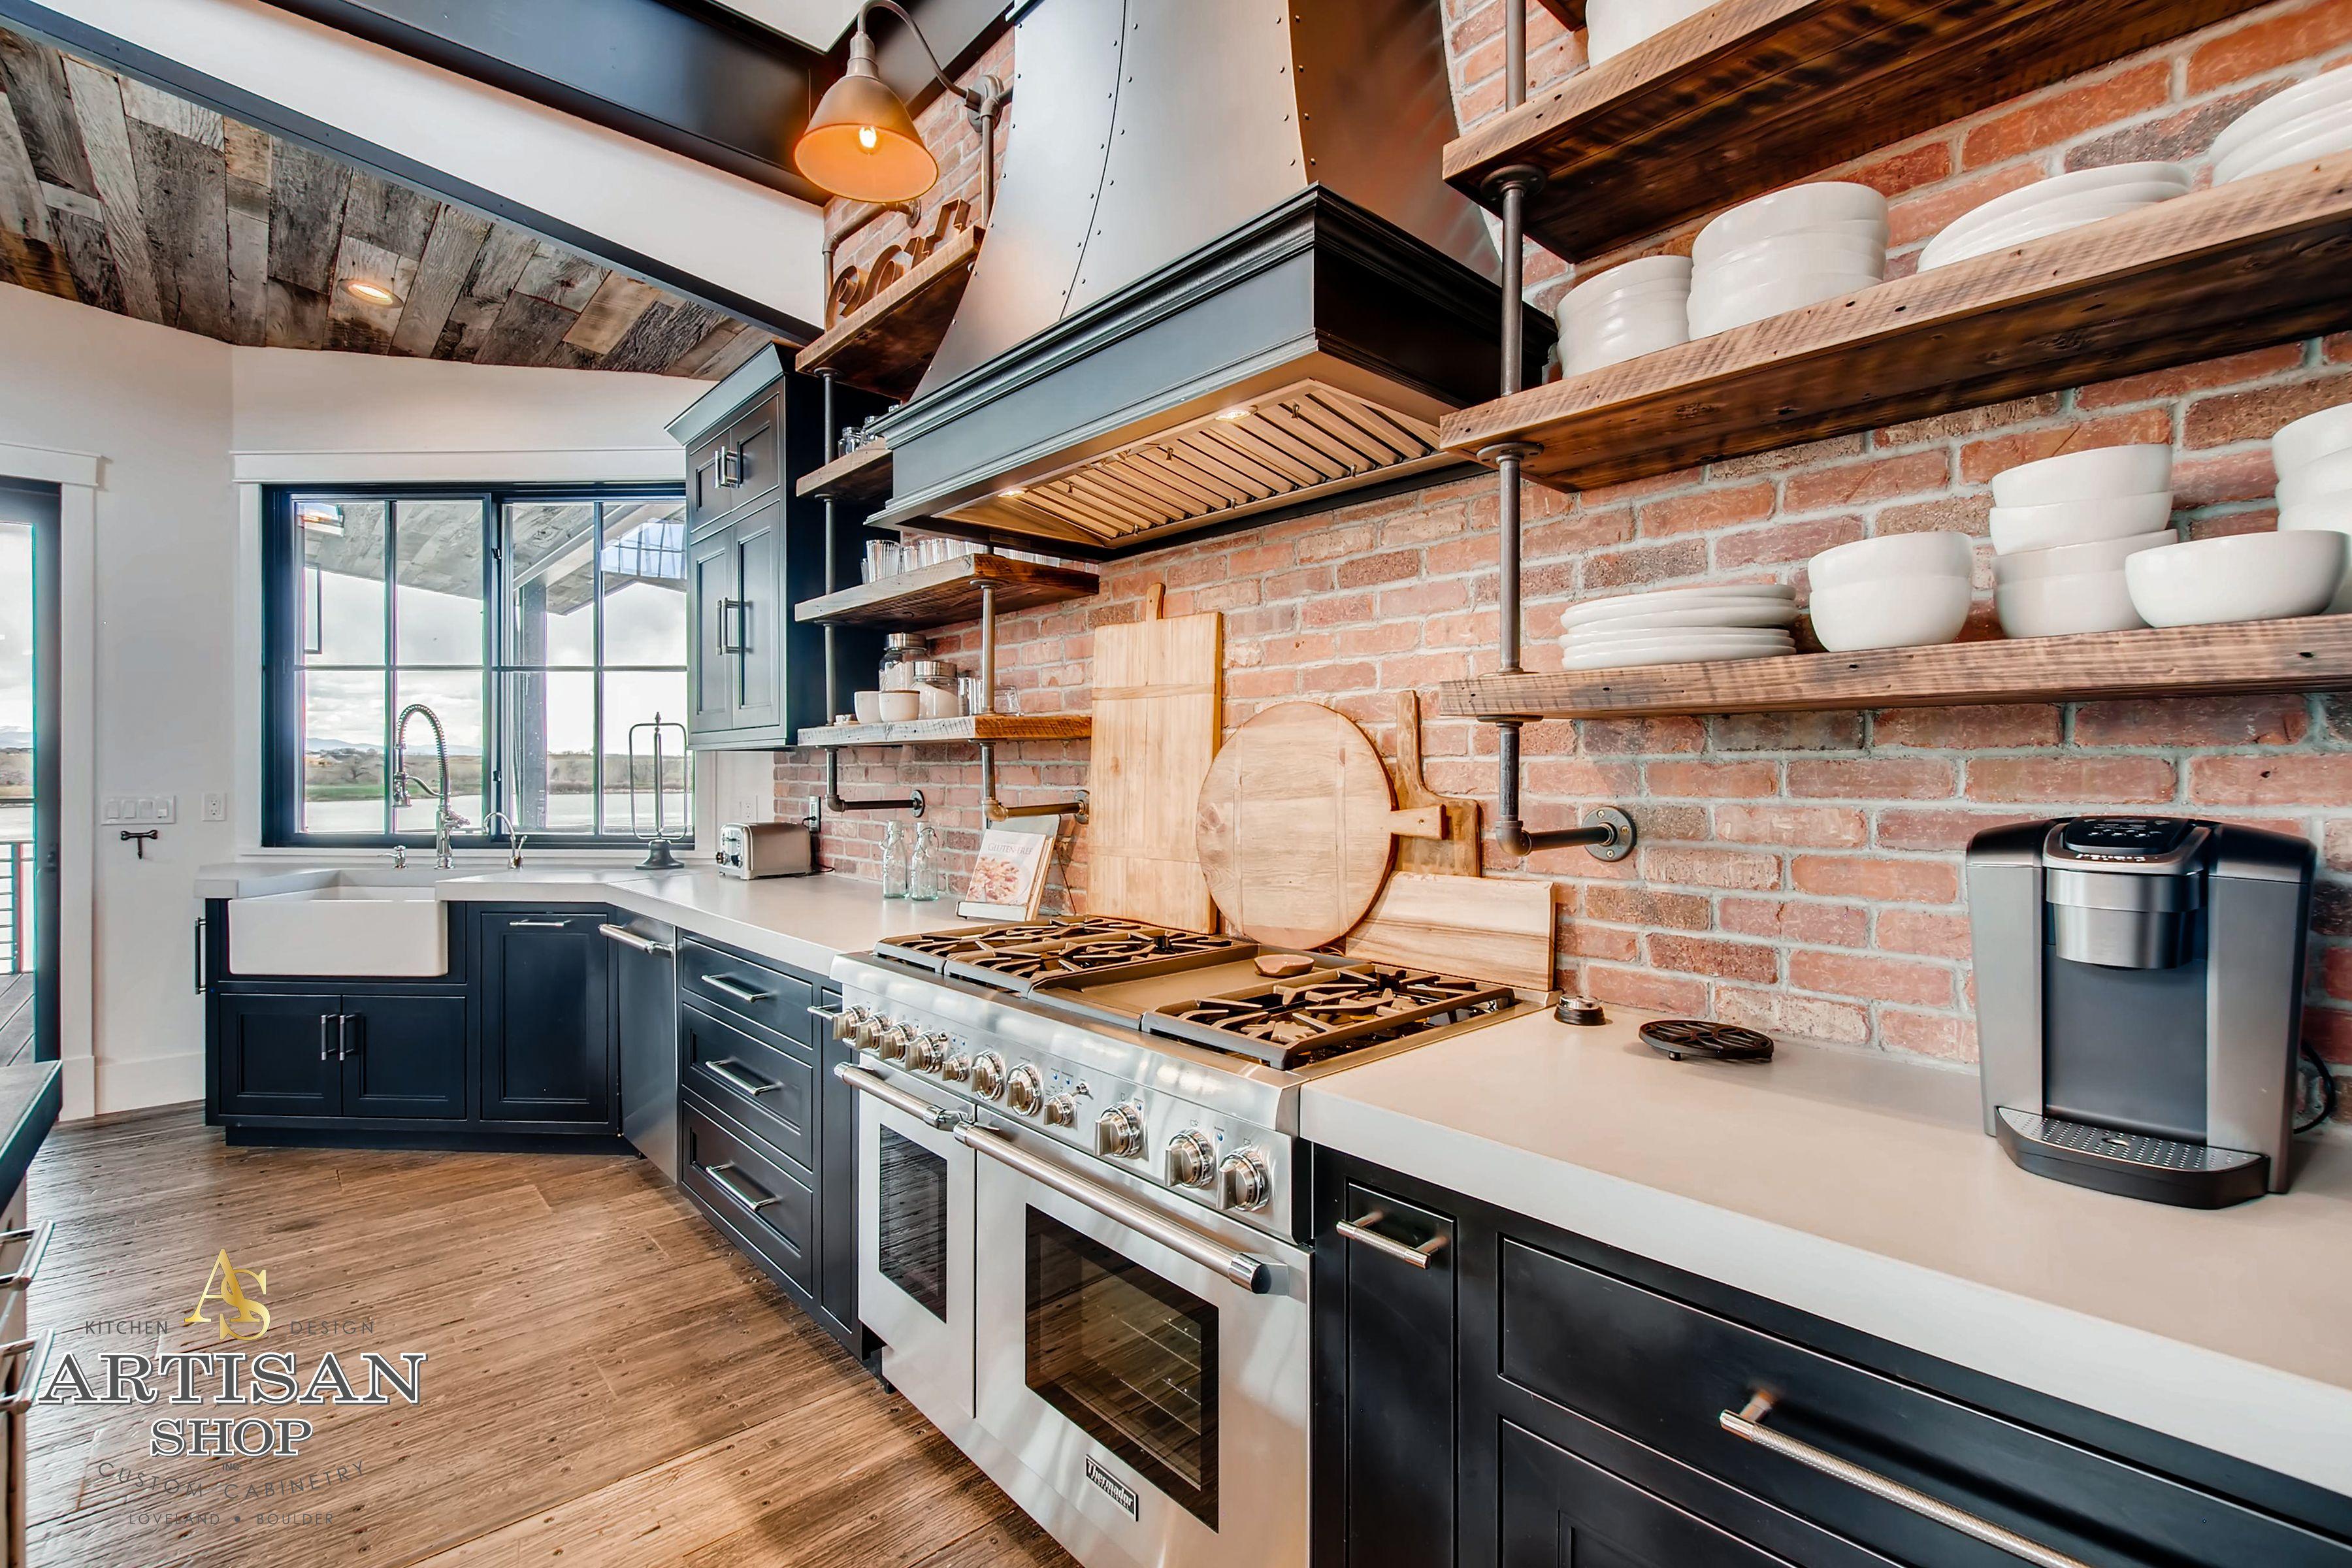 Clear Select Alder Exterior Rustic Knotty Alder Island Award Winning Kitchen Design Kitchen Design Award Winning Kitchen